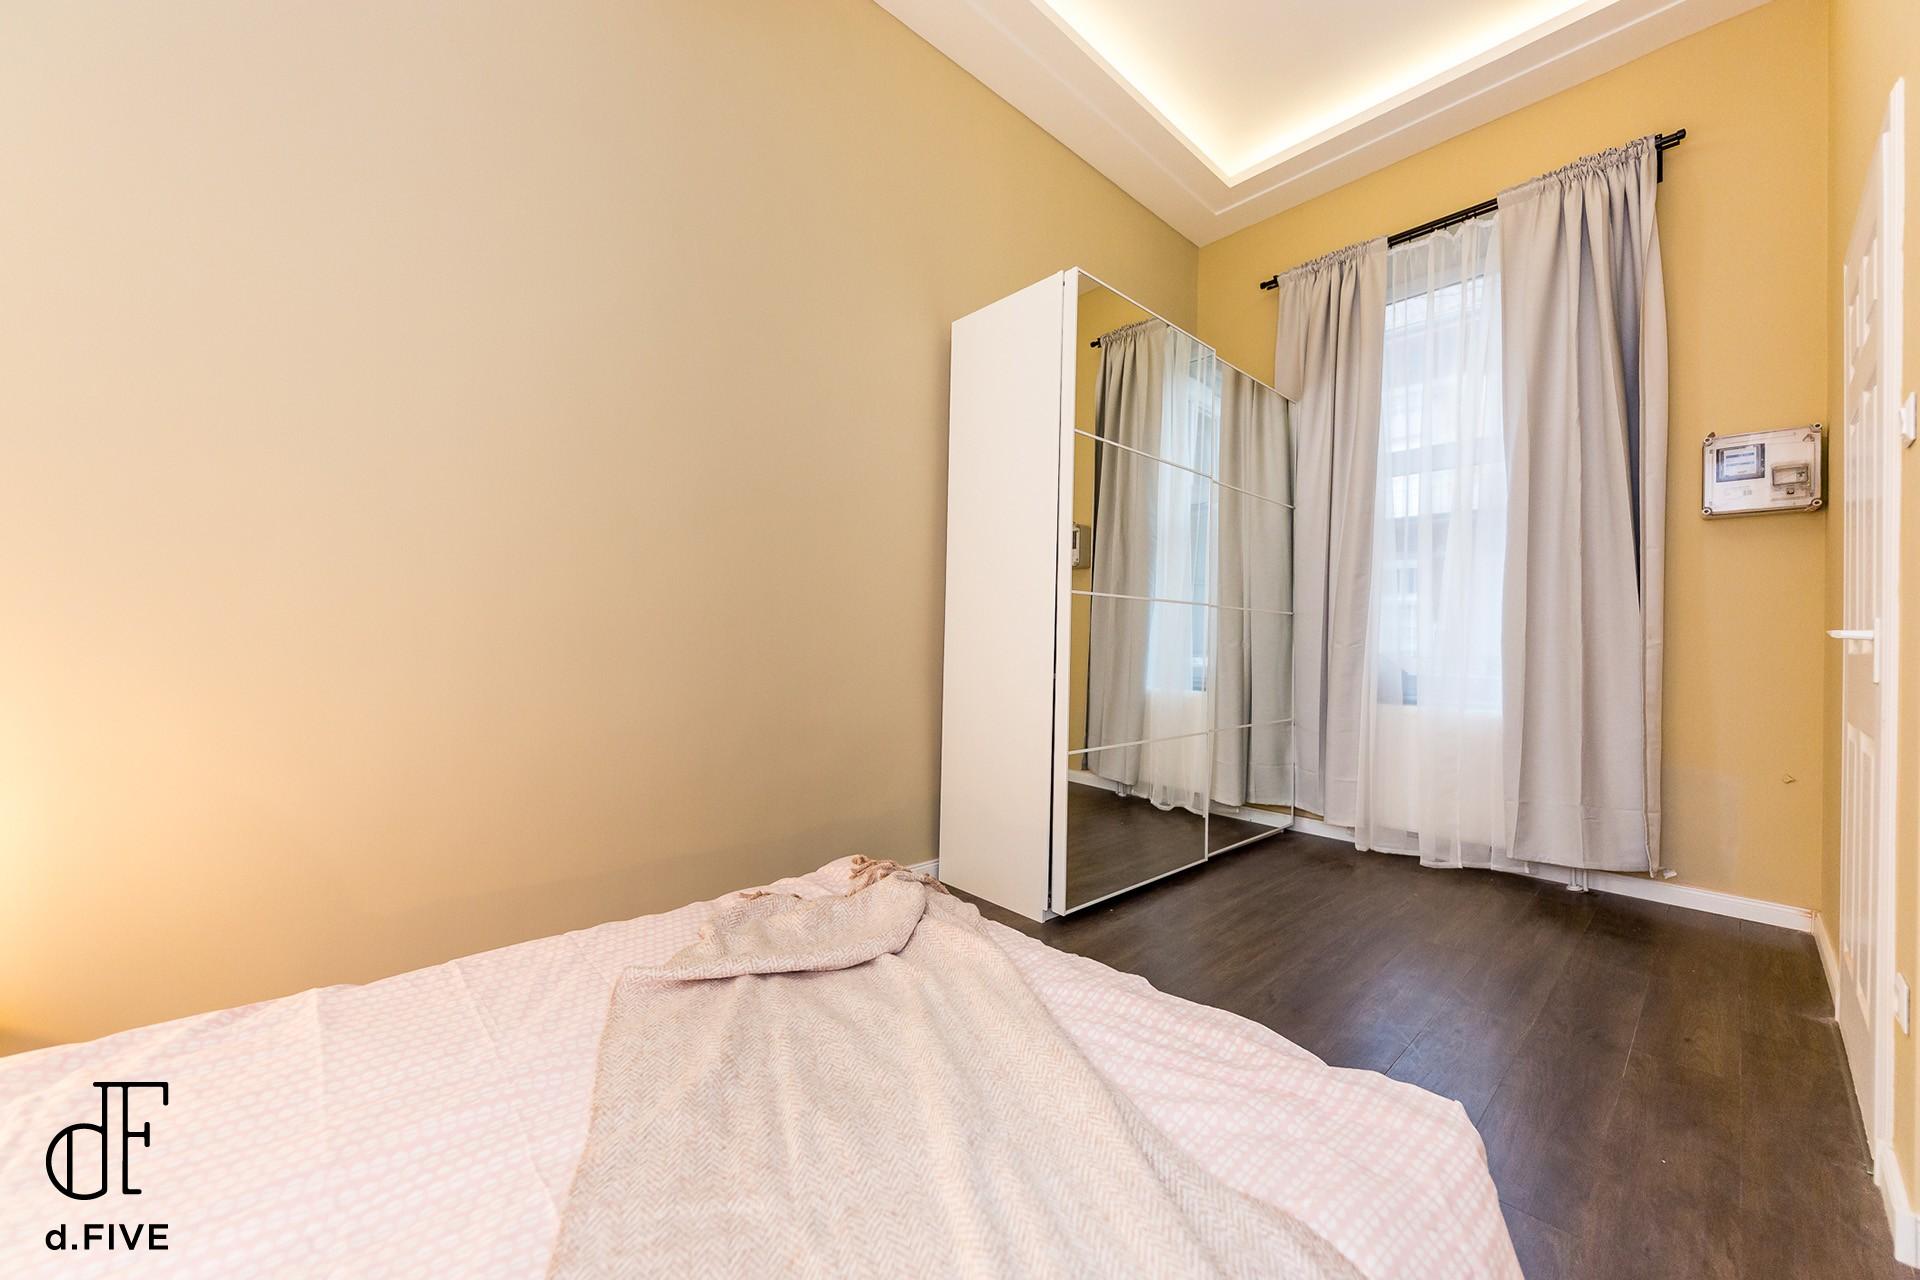 d.FIVE Gold Apartment